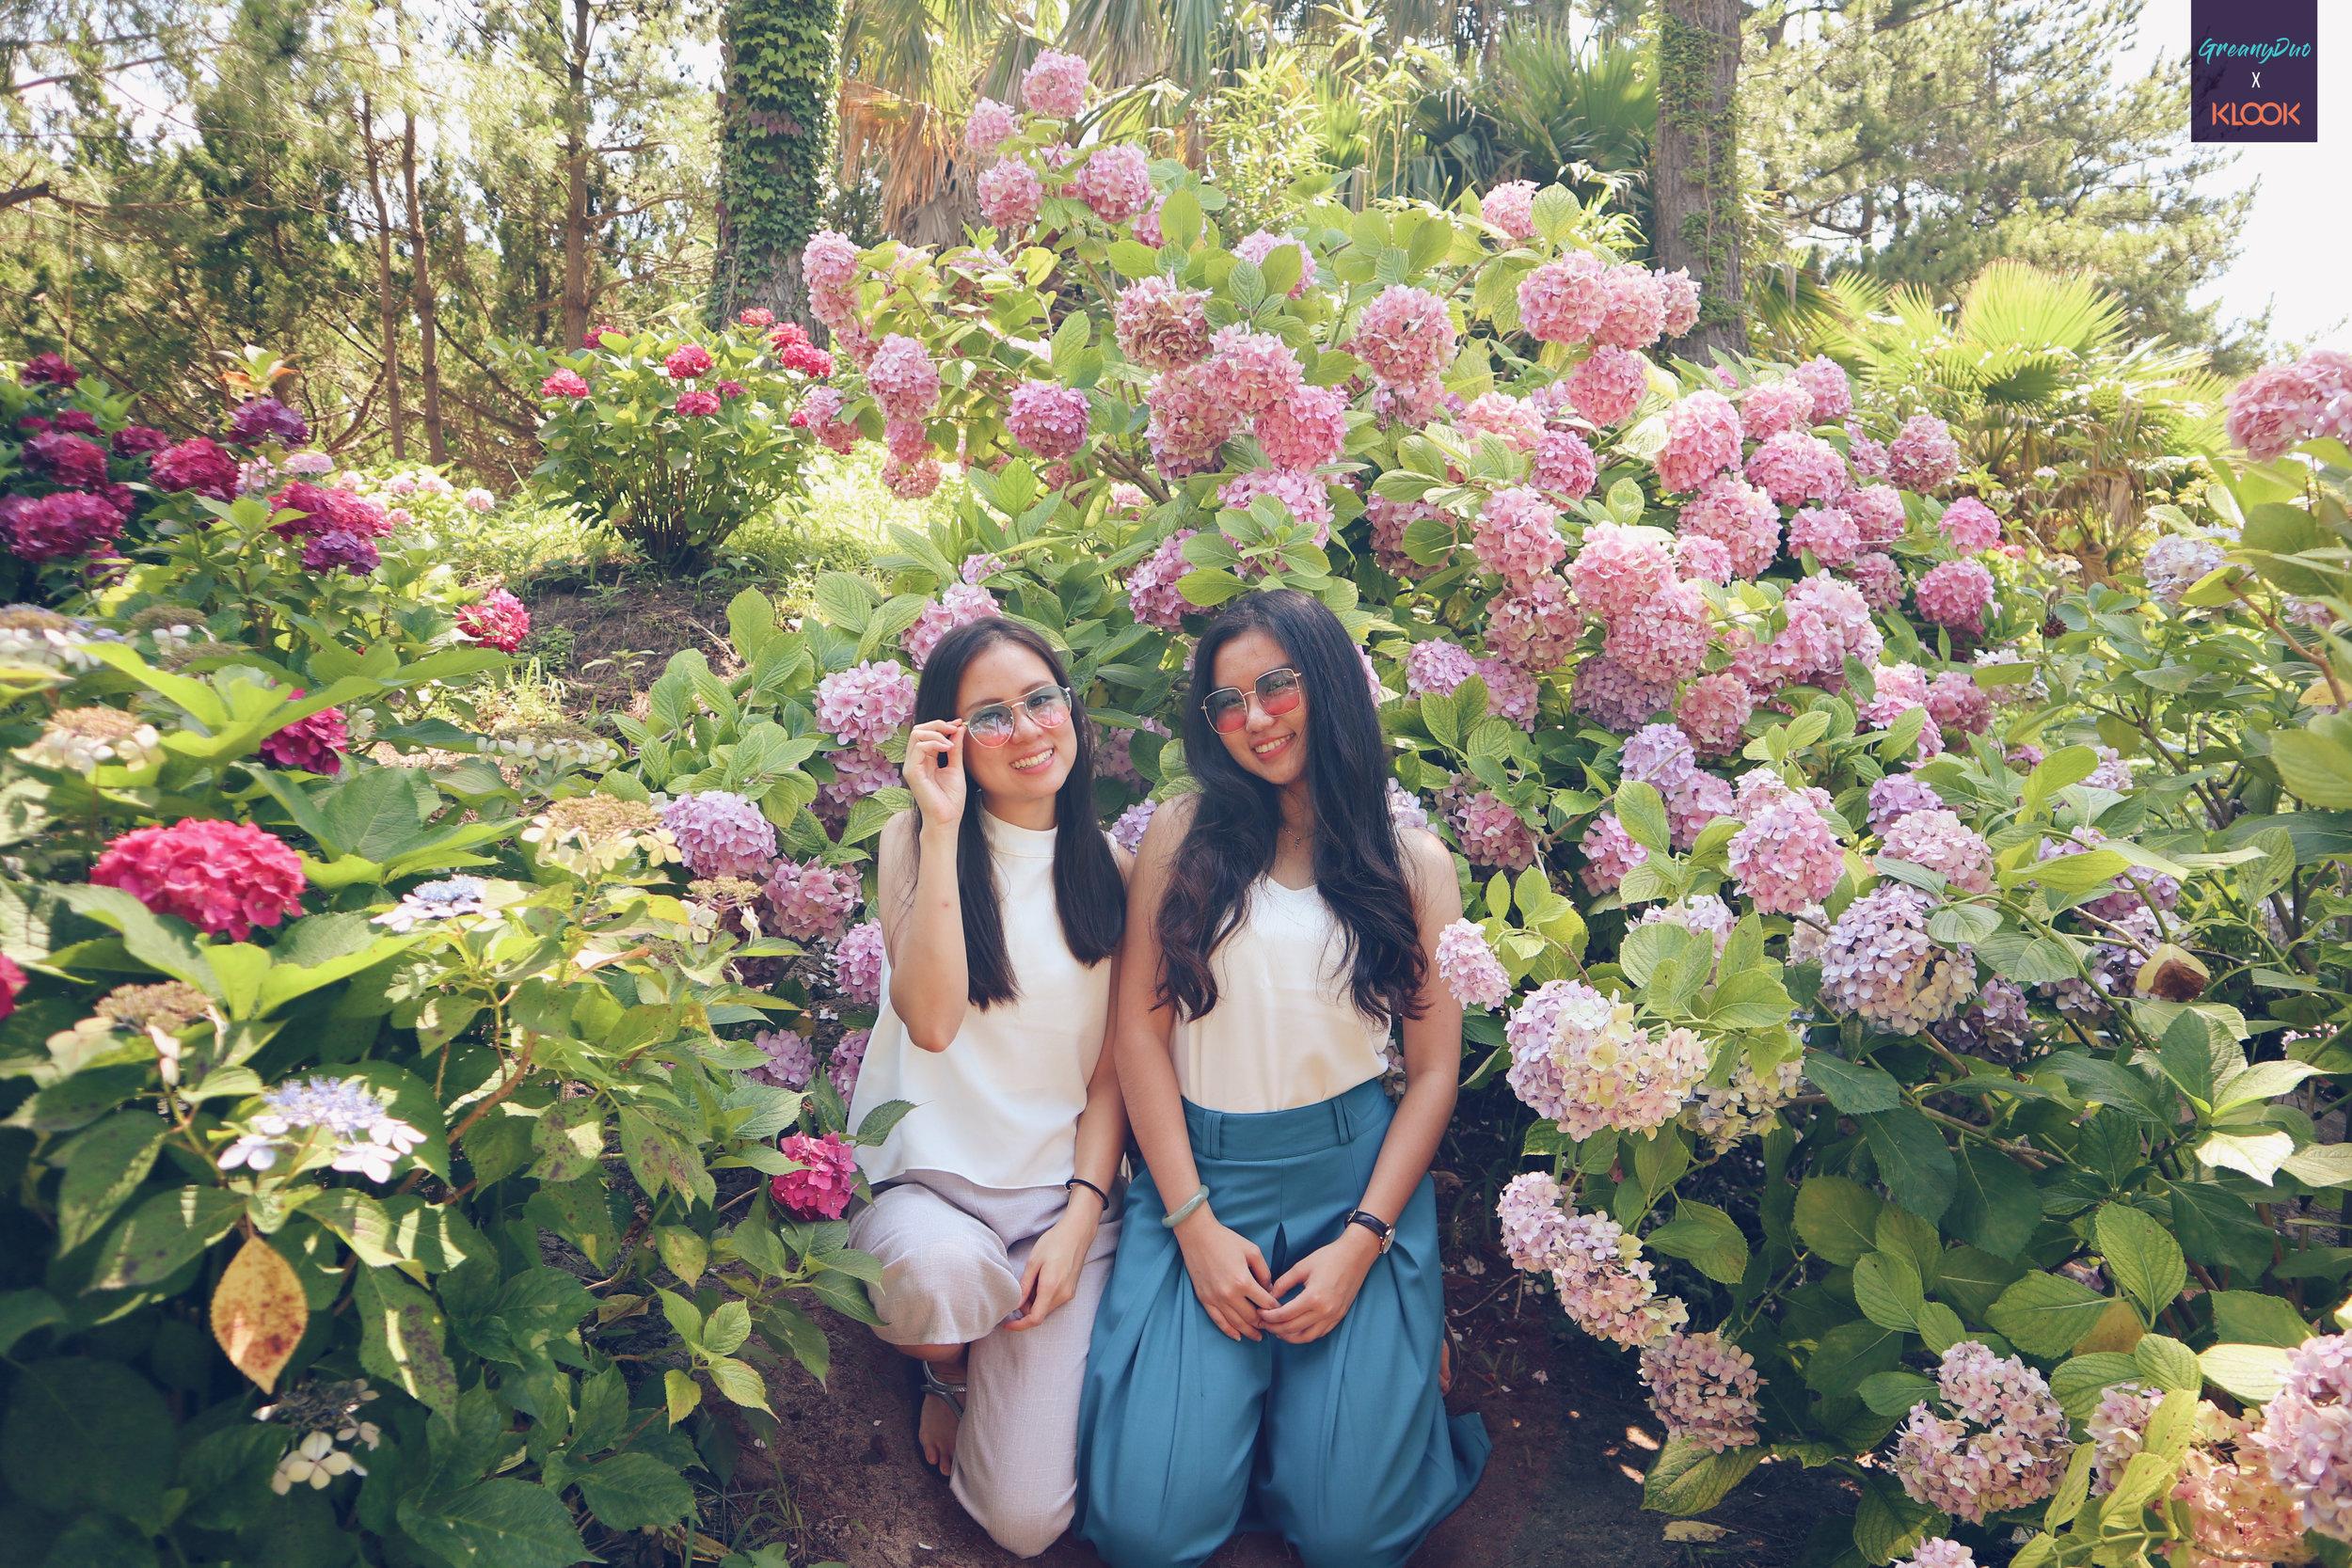 jenny & tina posting with hydrangea flower at halliam park, jeju